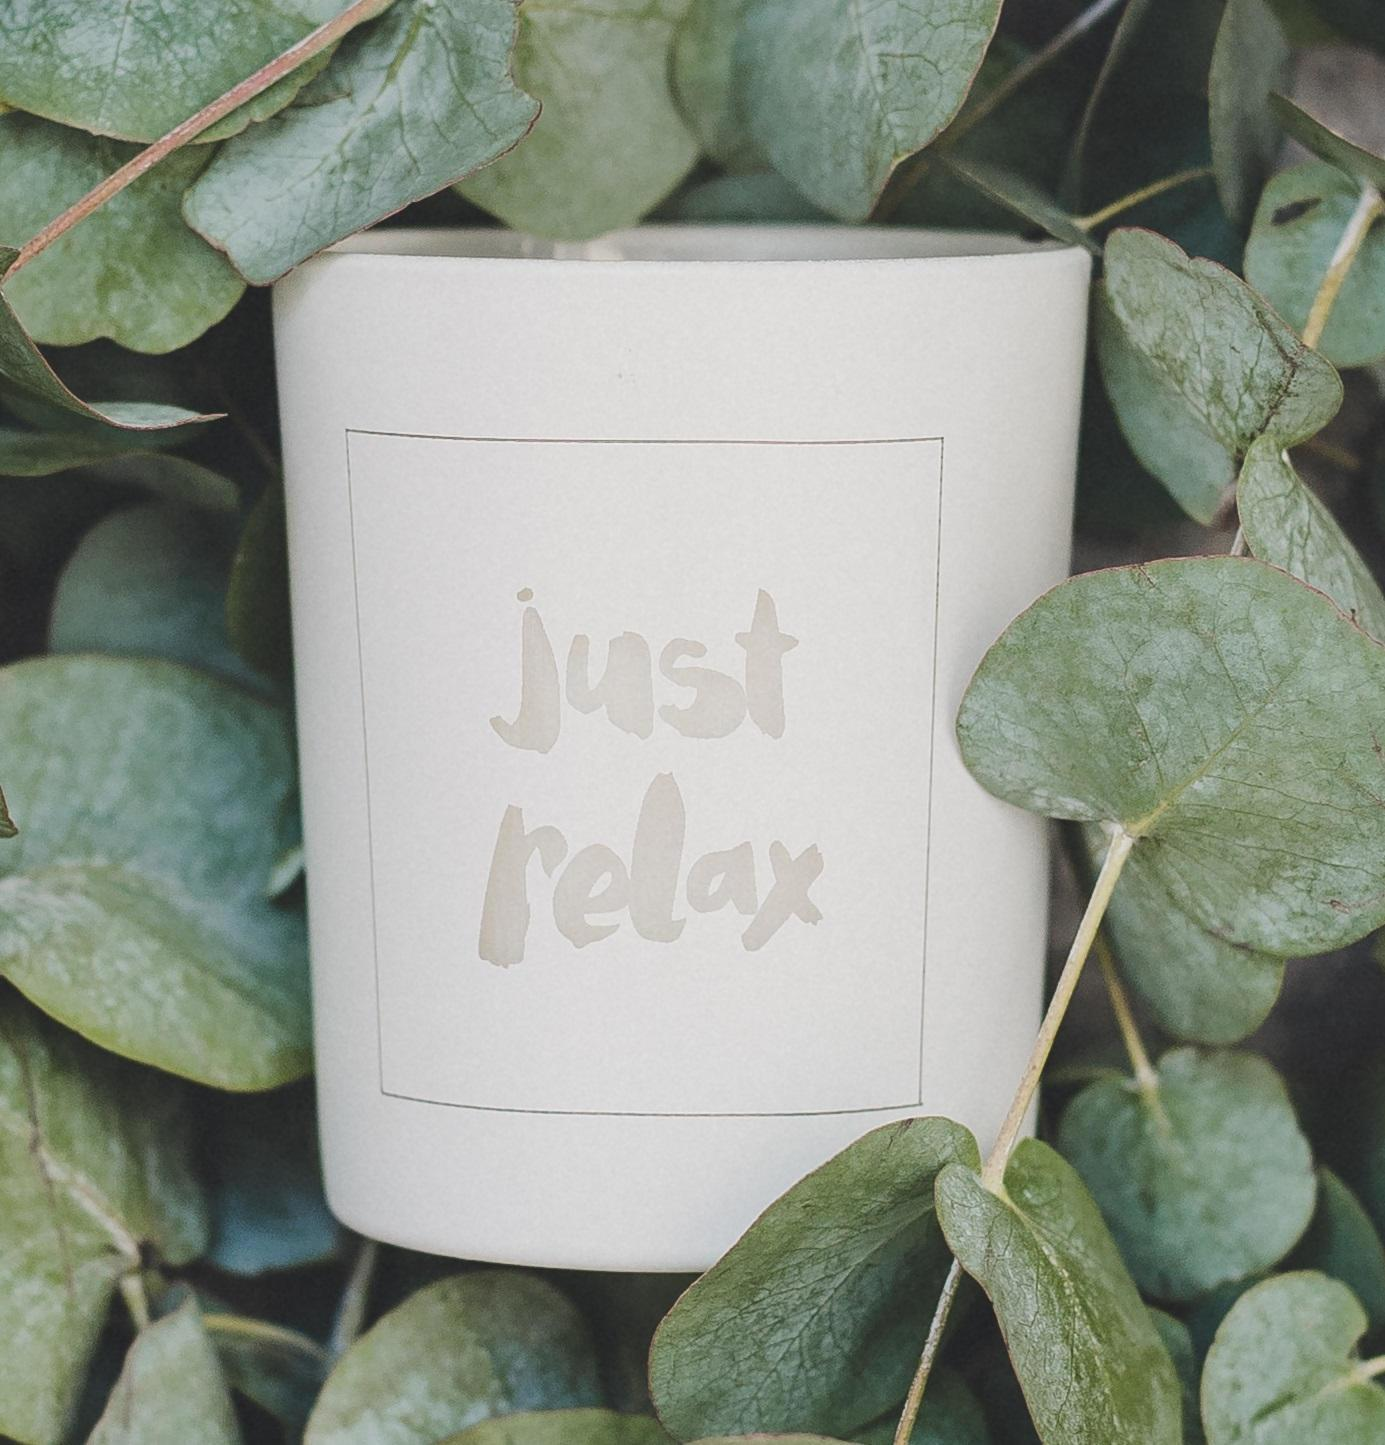 Love Inc. Bílá svíčka Just relax - peprmint a eucalyptus, bílá barva, sklo, dřevo, vosk